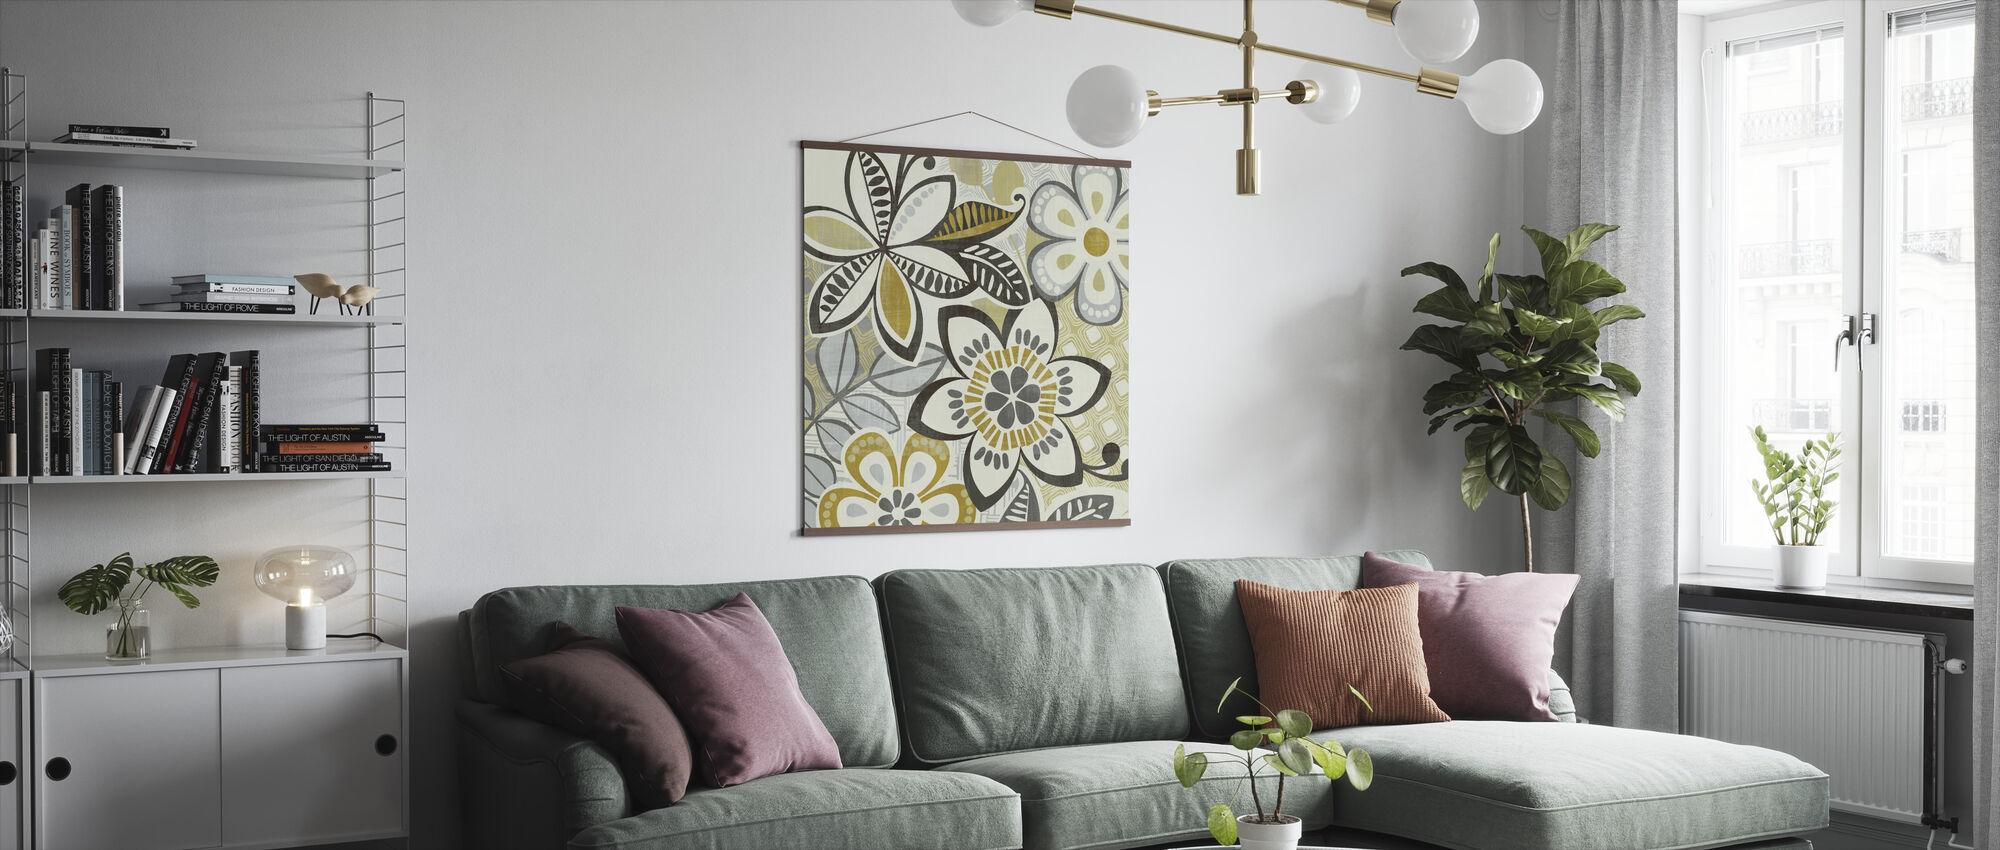 Free Wheelin I - Poster - Living Room